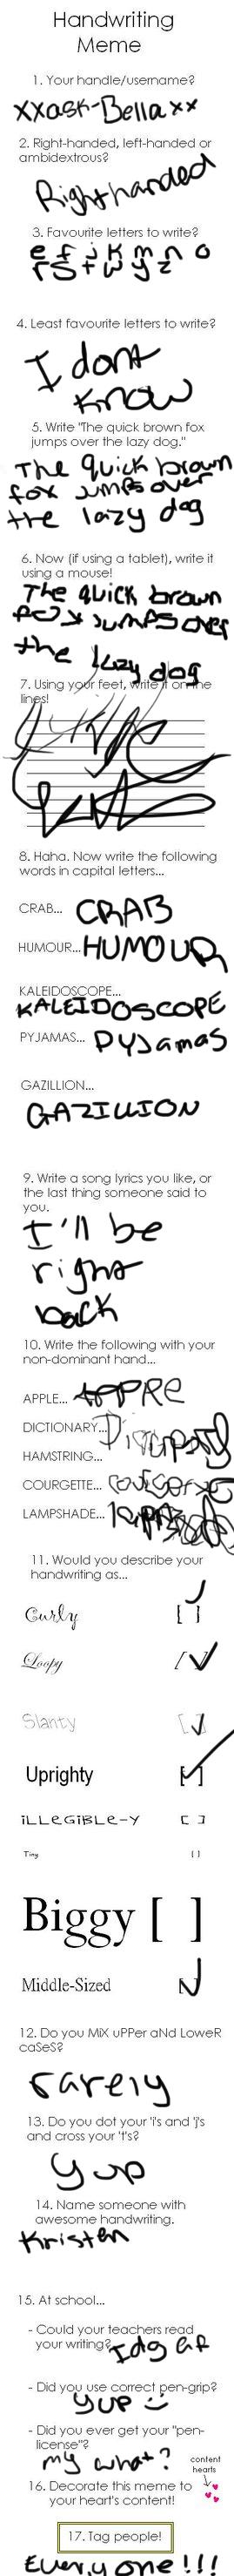 Handwriting Meme by xxask-Bellaxx